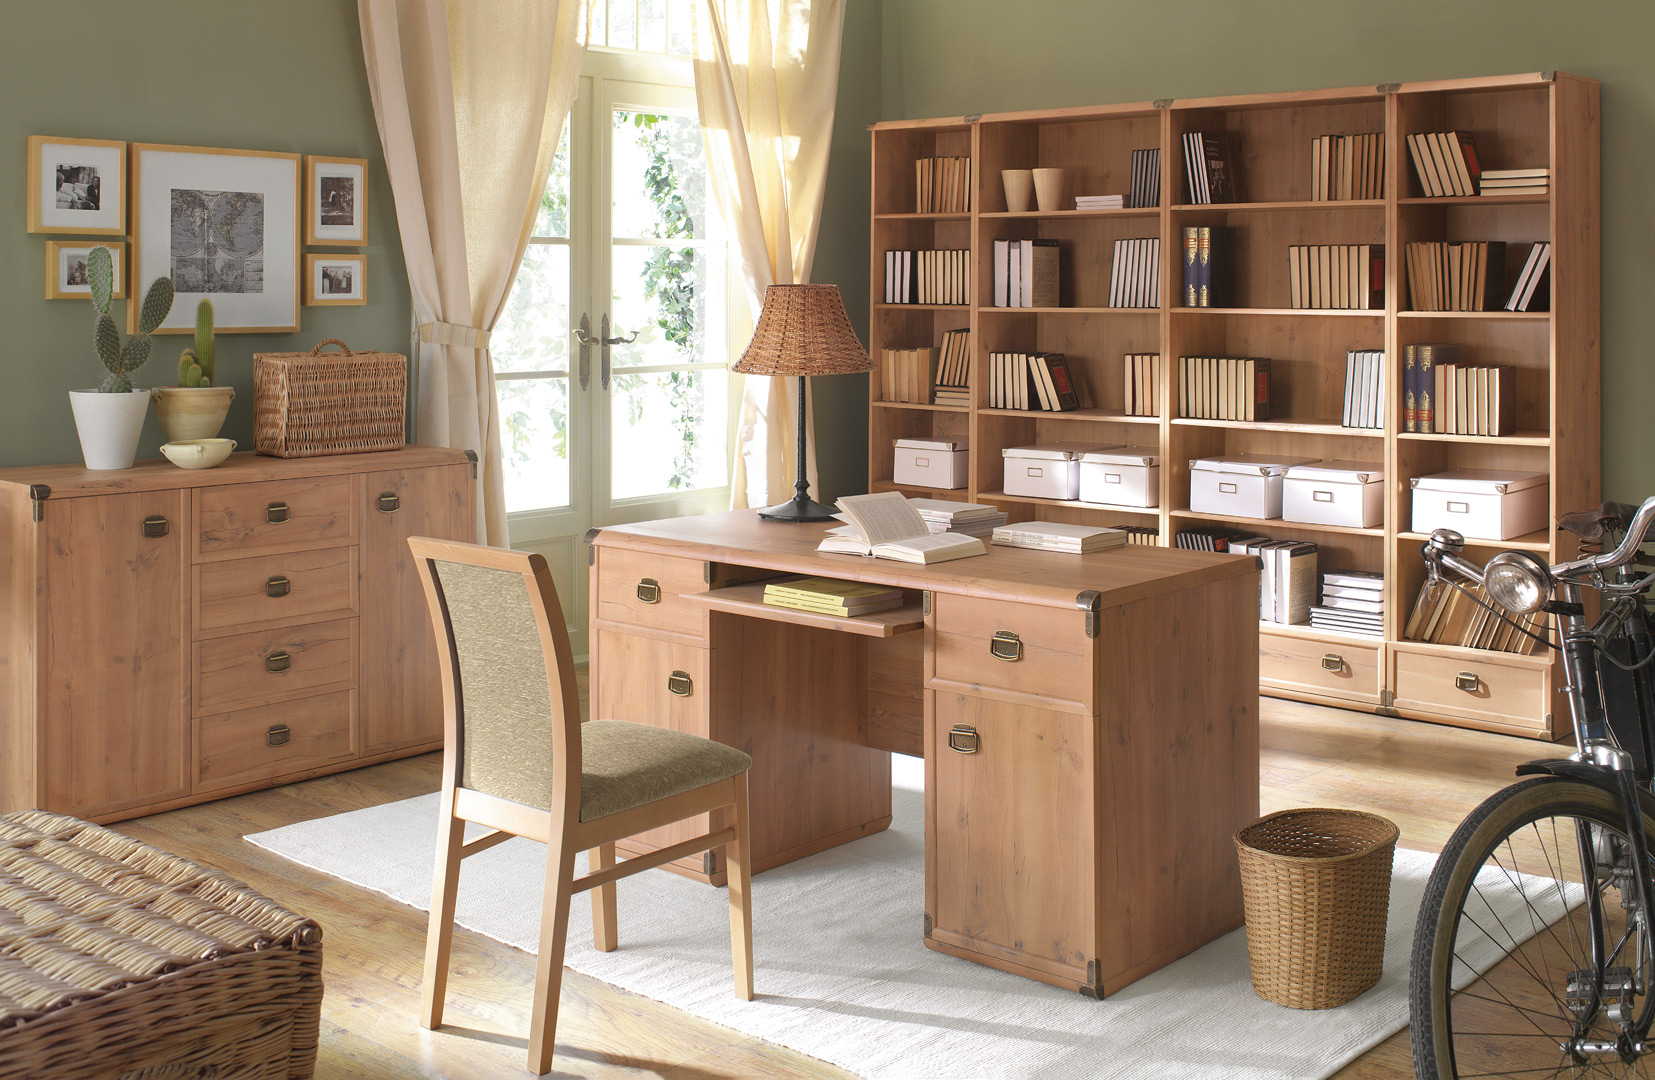 B ro komplett b rom bel arbeitszimmer einrichtung Home furniture rental indiana